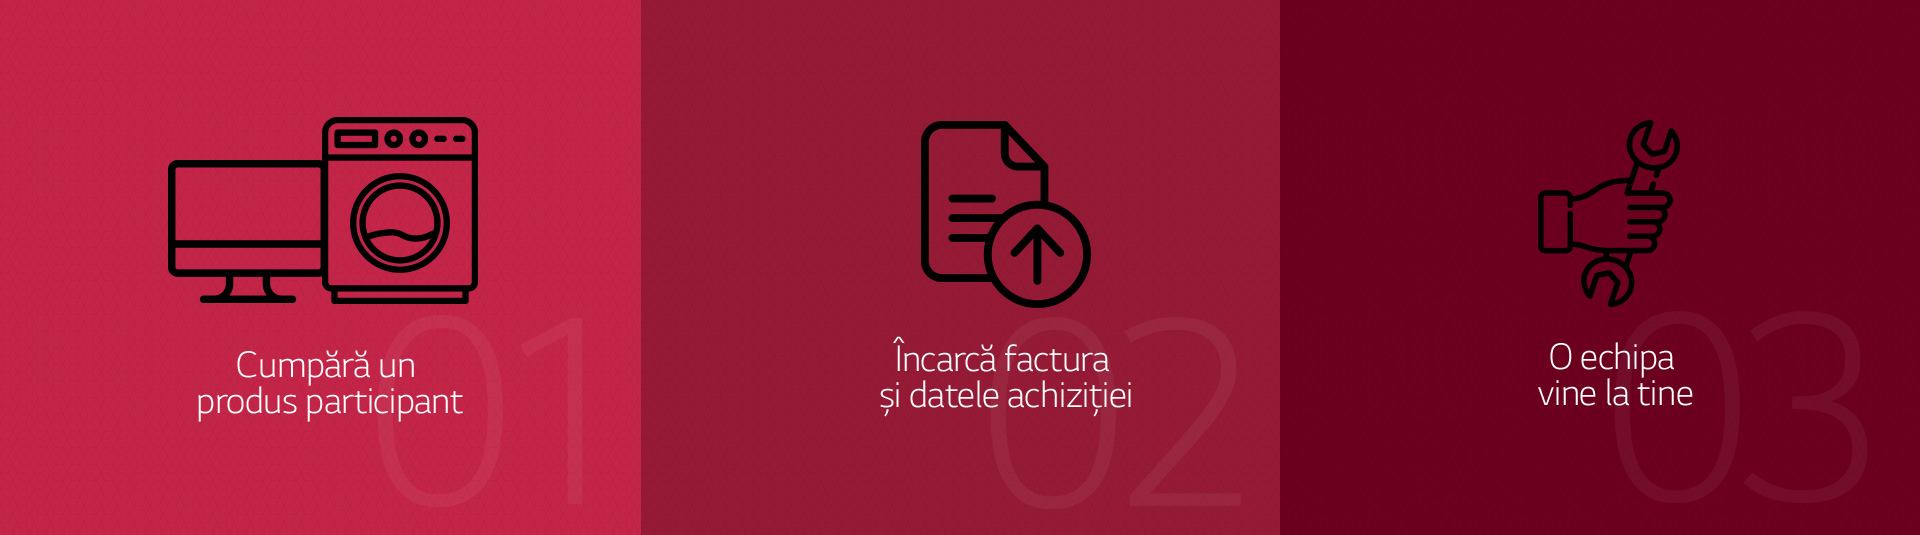 Logo edenia@2x